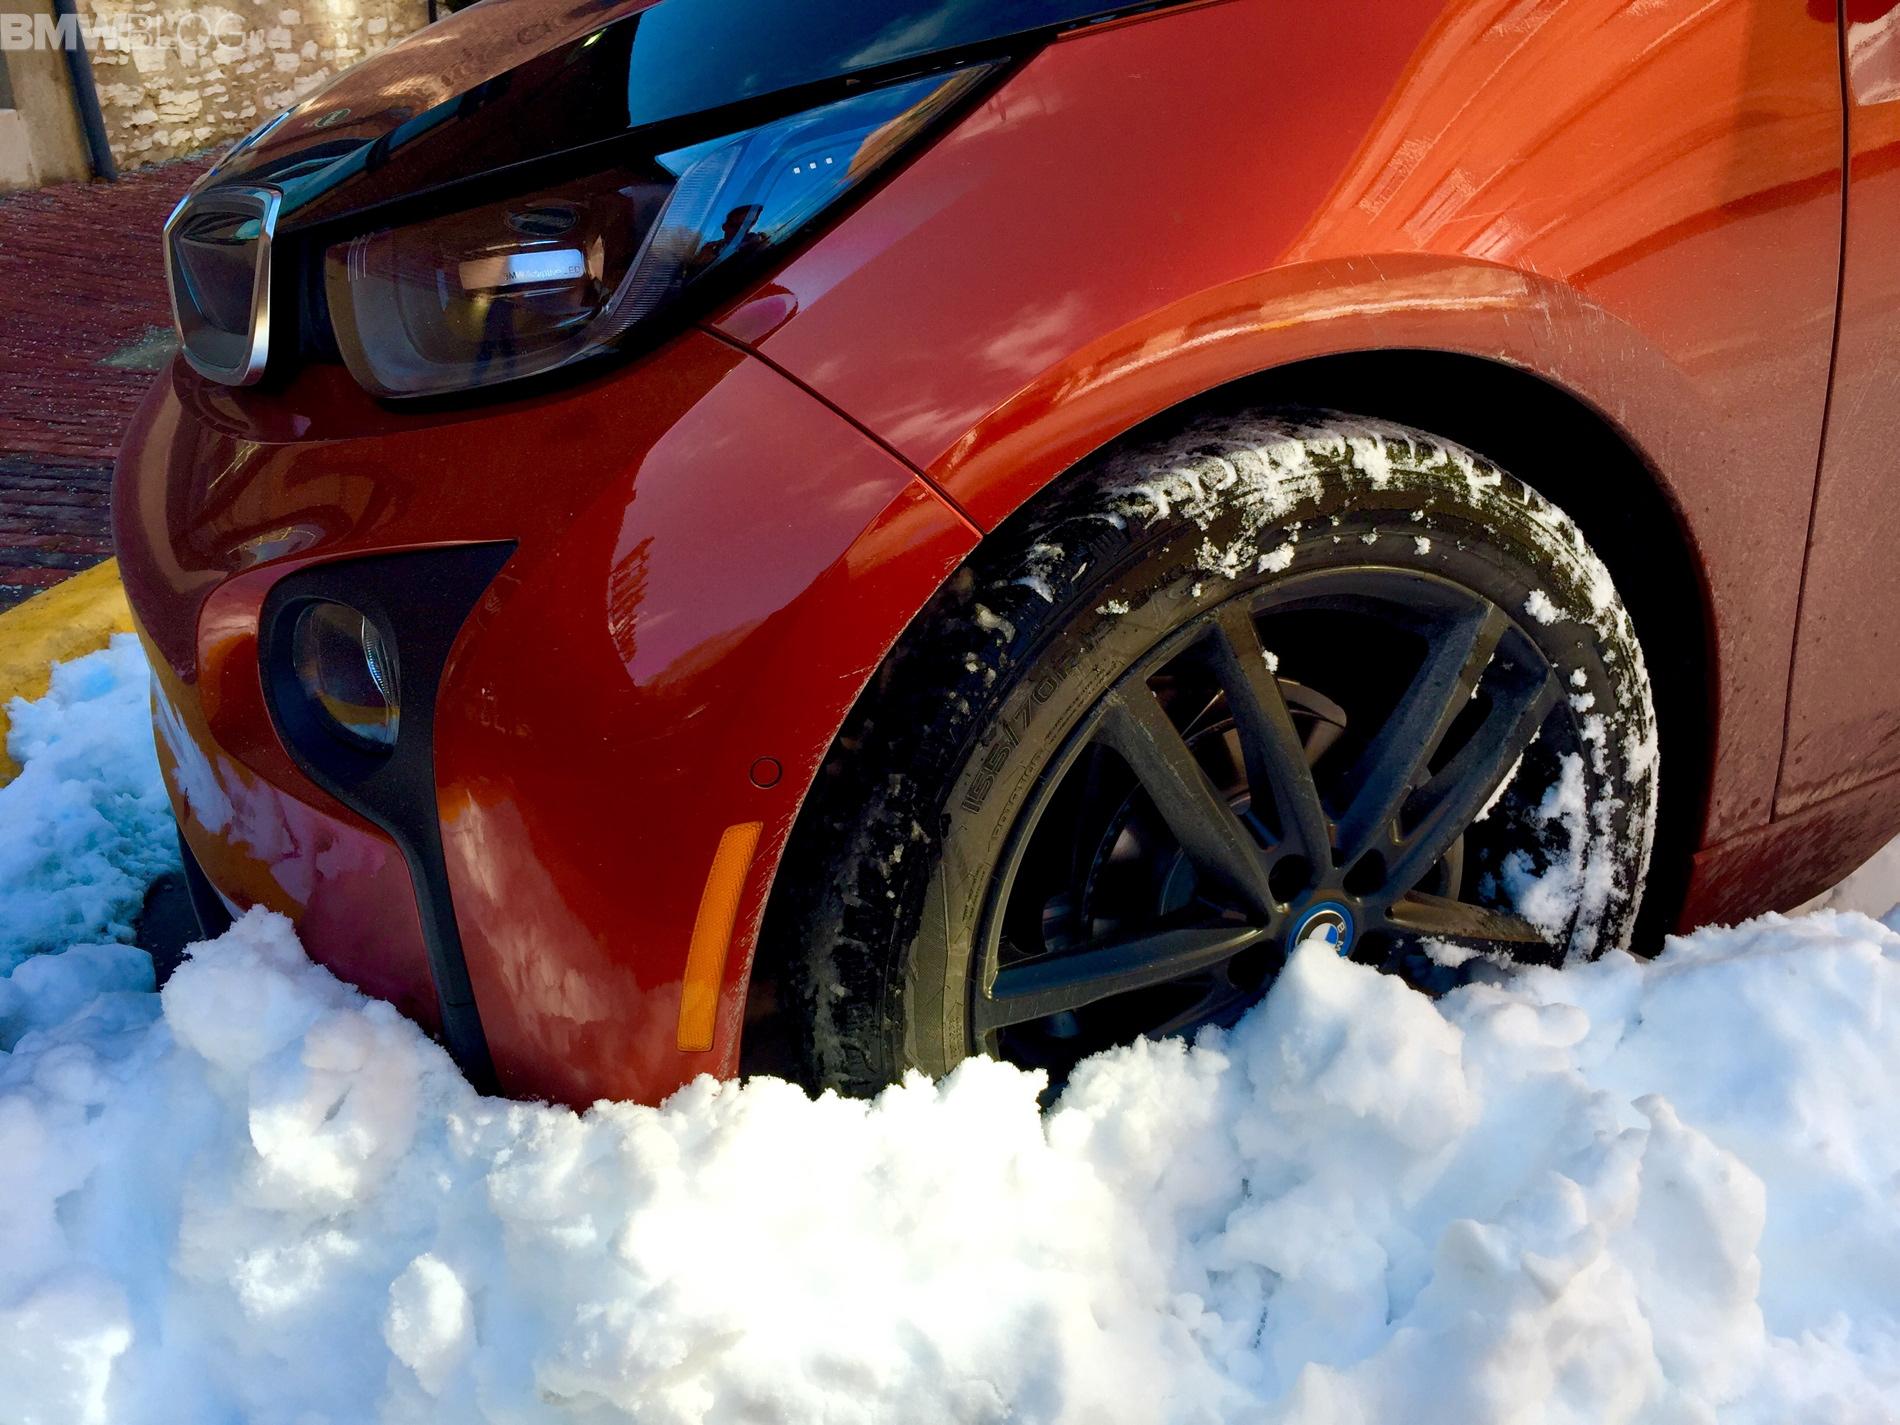 BMW i3 Winter Tires Review Bridgestone Blizzak LM 500 vs Nokian